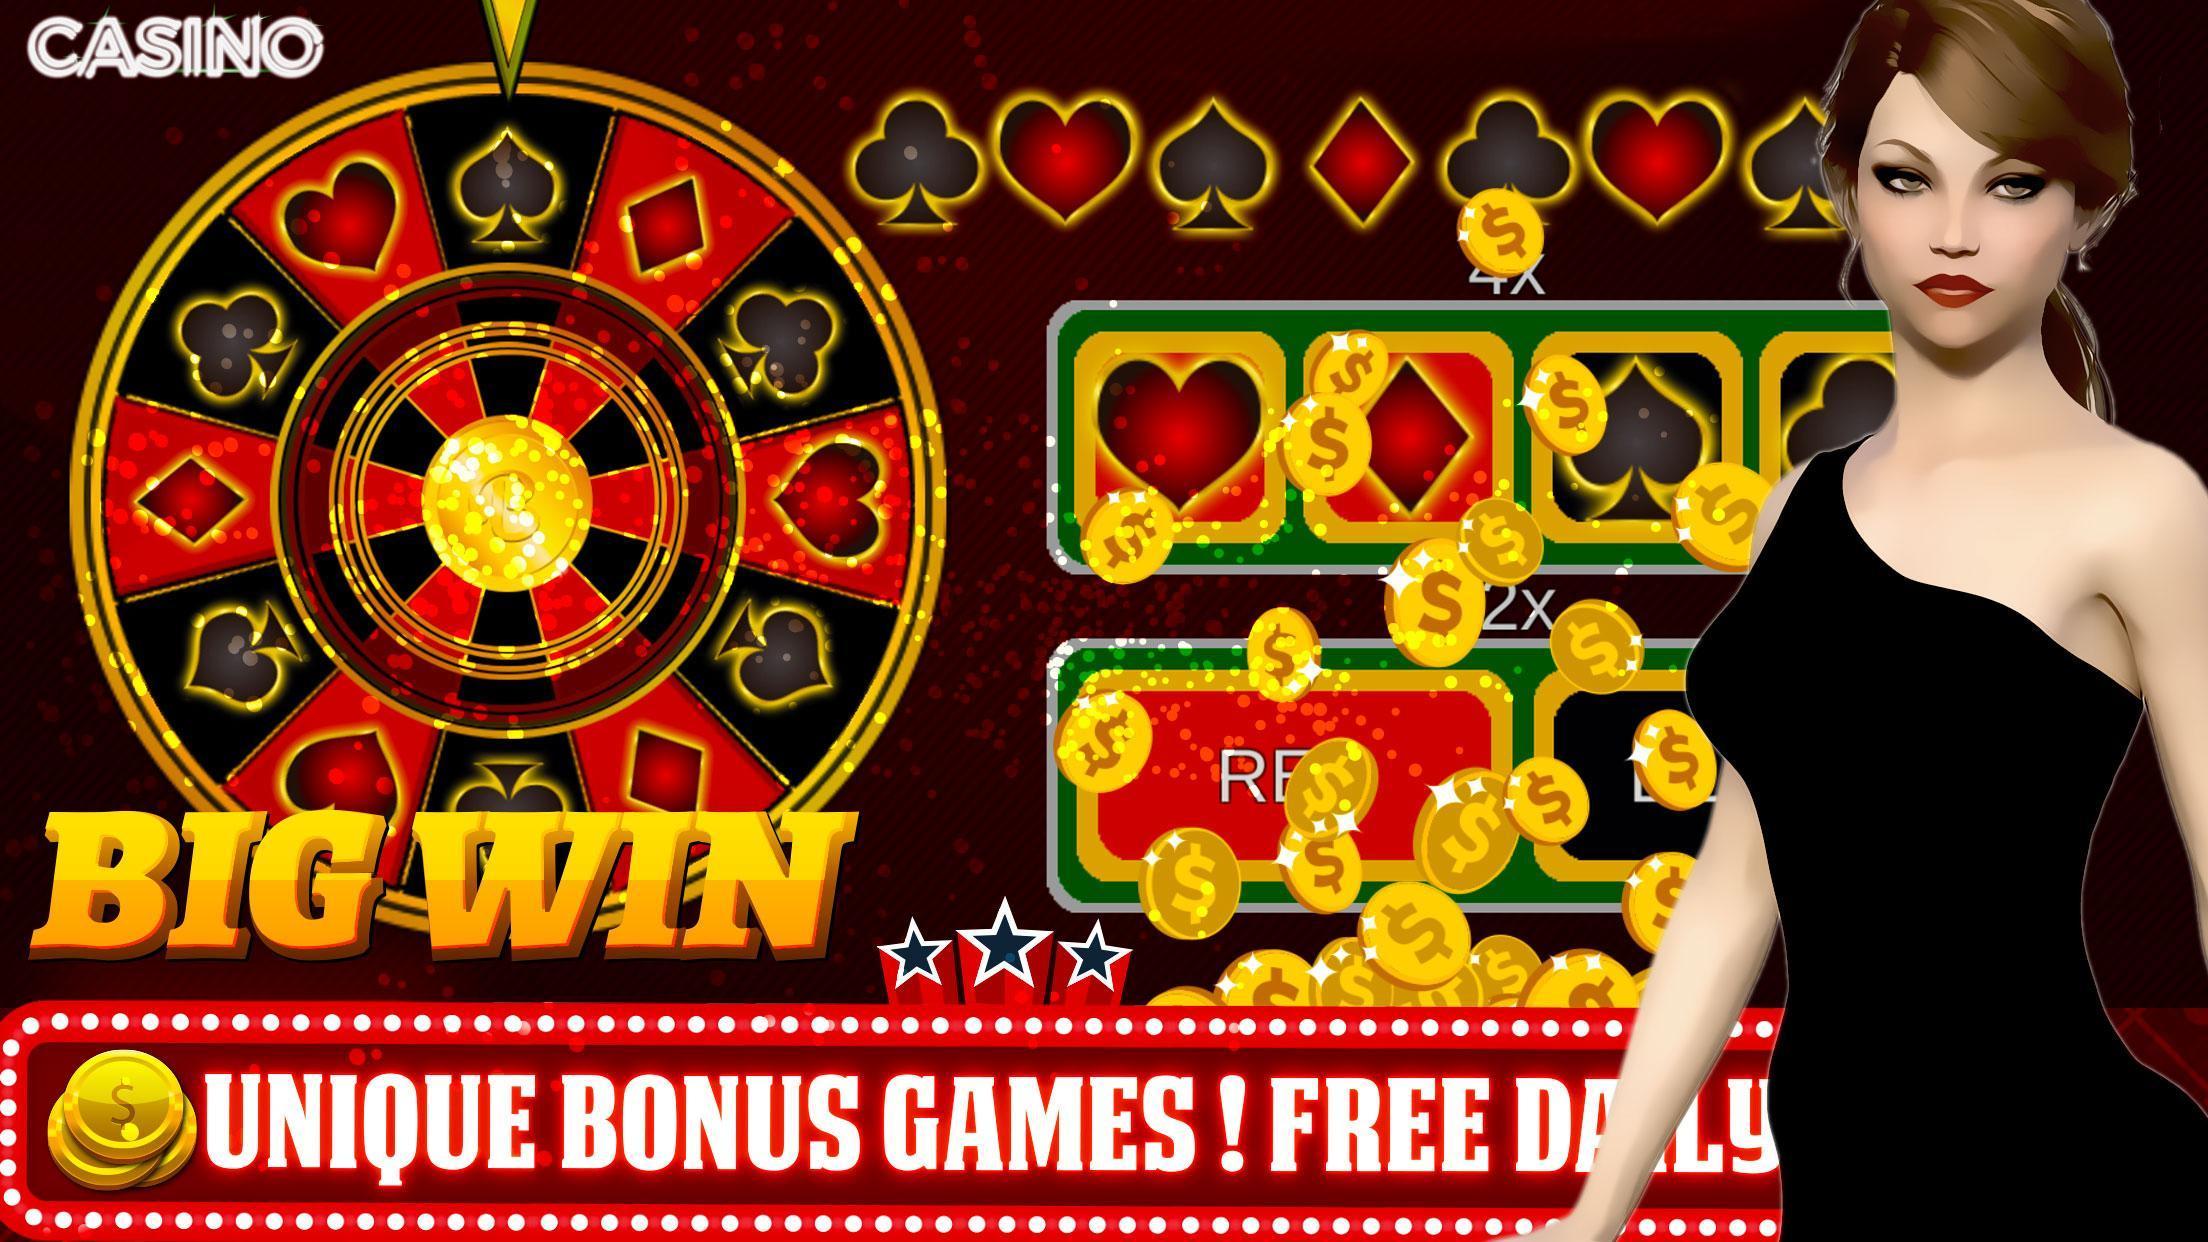 22bet casino no deposit